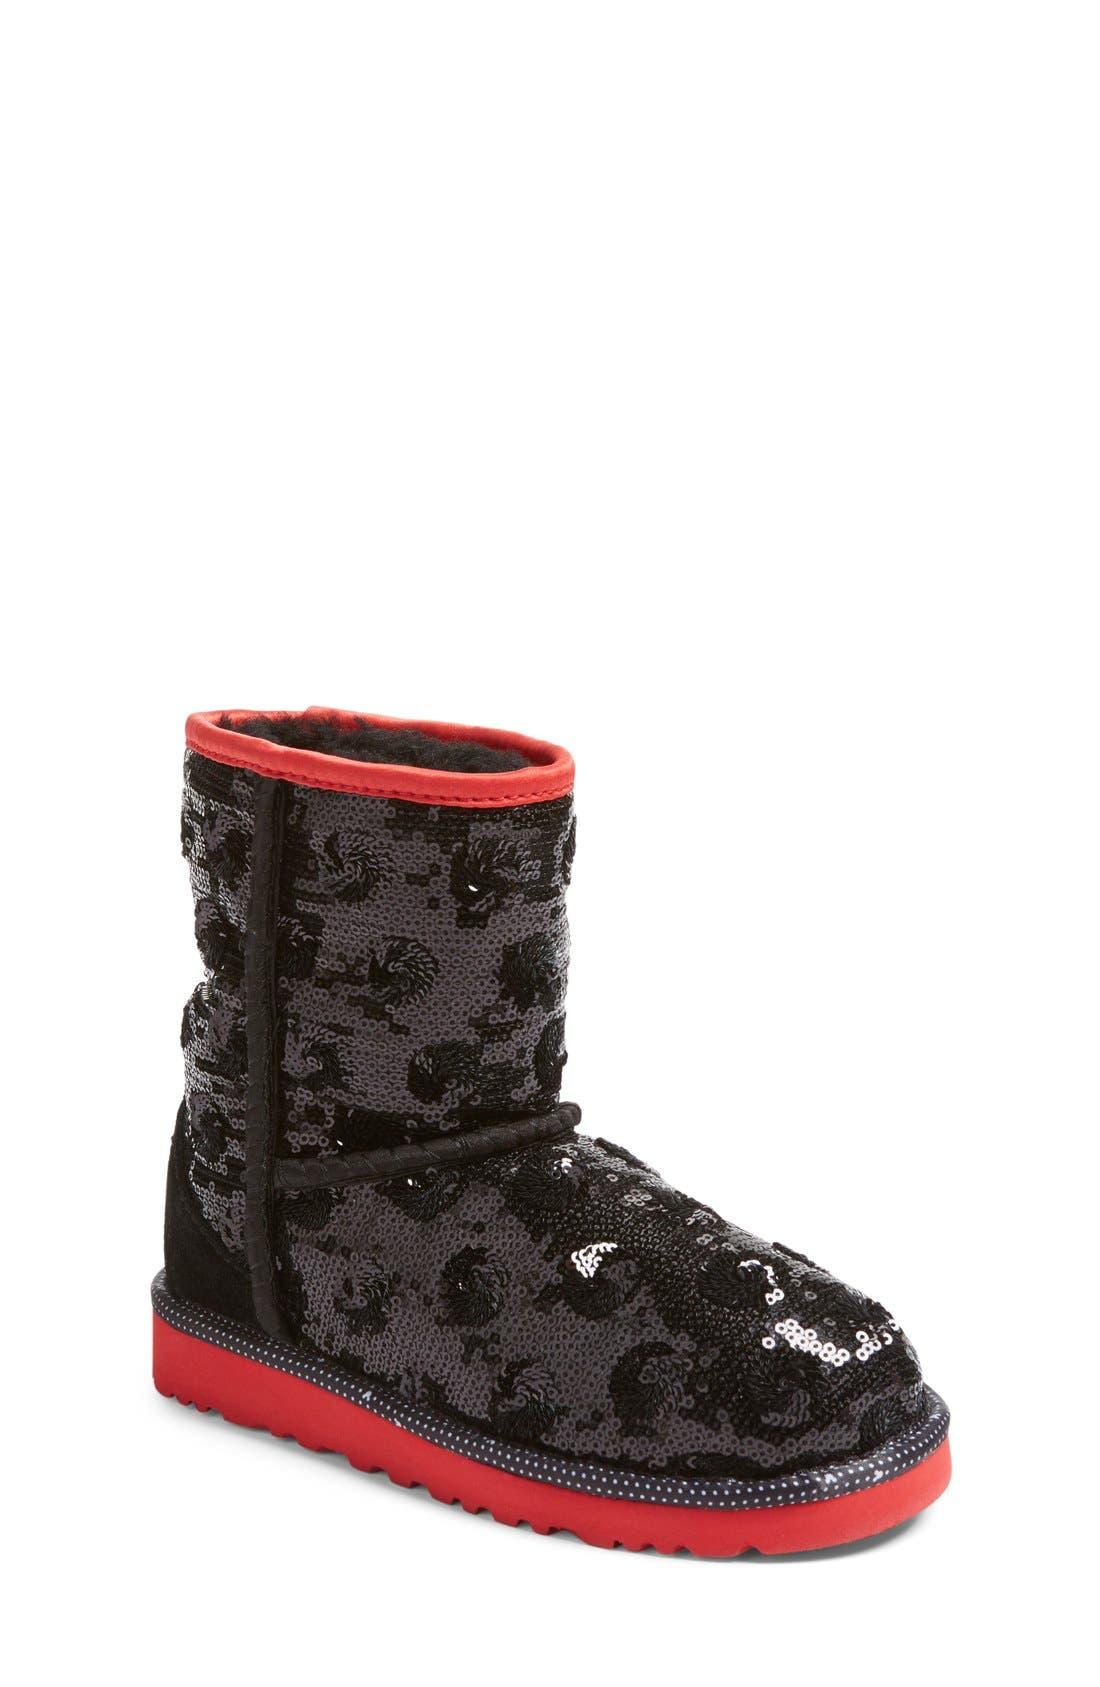 Main Image - UGG® x Disney Minerva Short Boot (Little Kid & Big Kid)